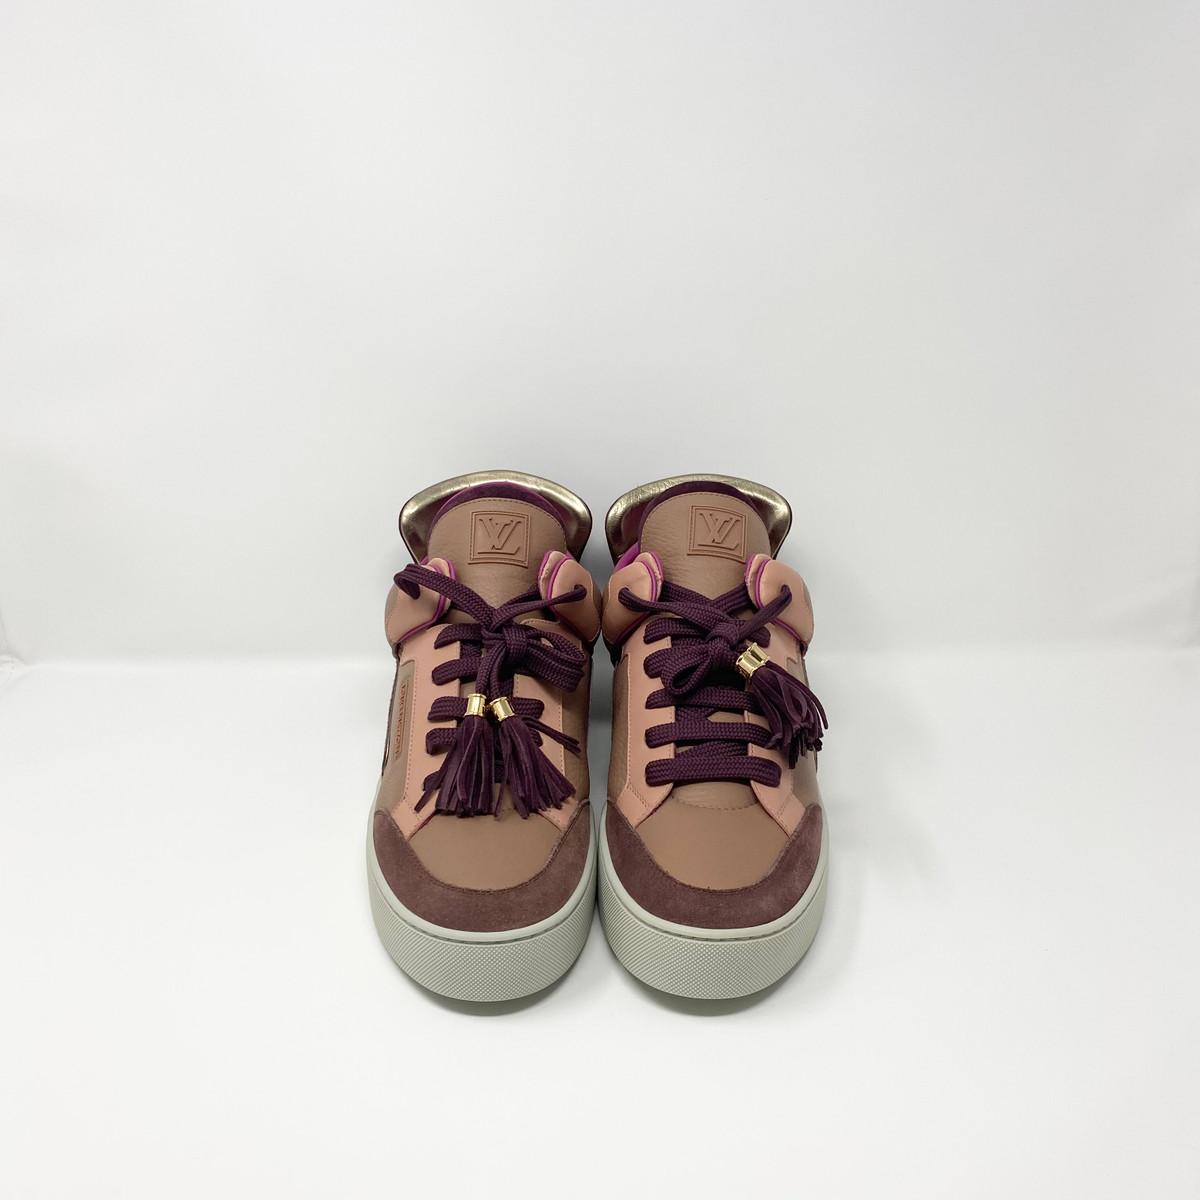 Louis Vuitton Don Patchwork Kanye